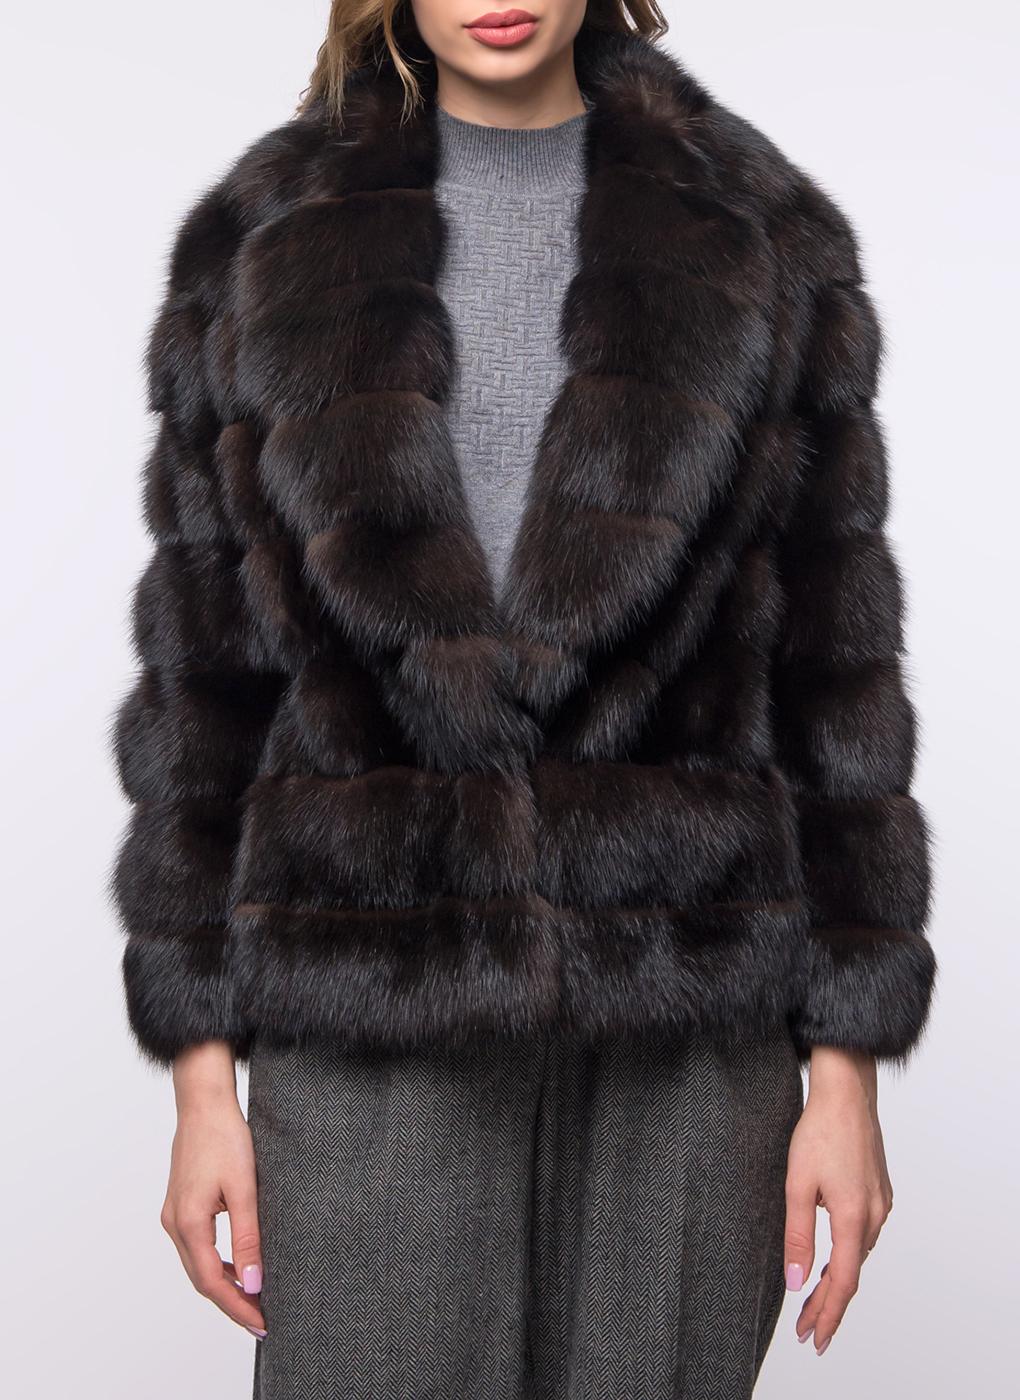 Куртка из куницы Бьорк 01, Олимп